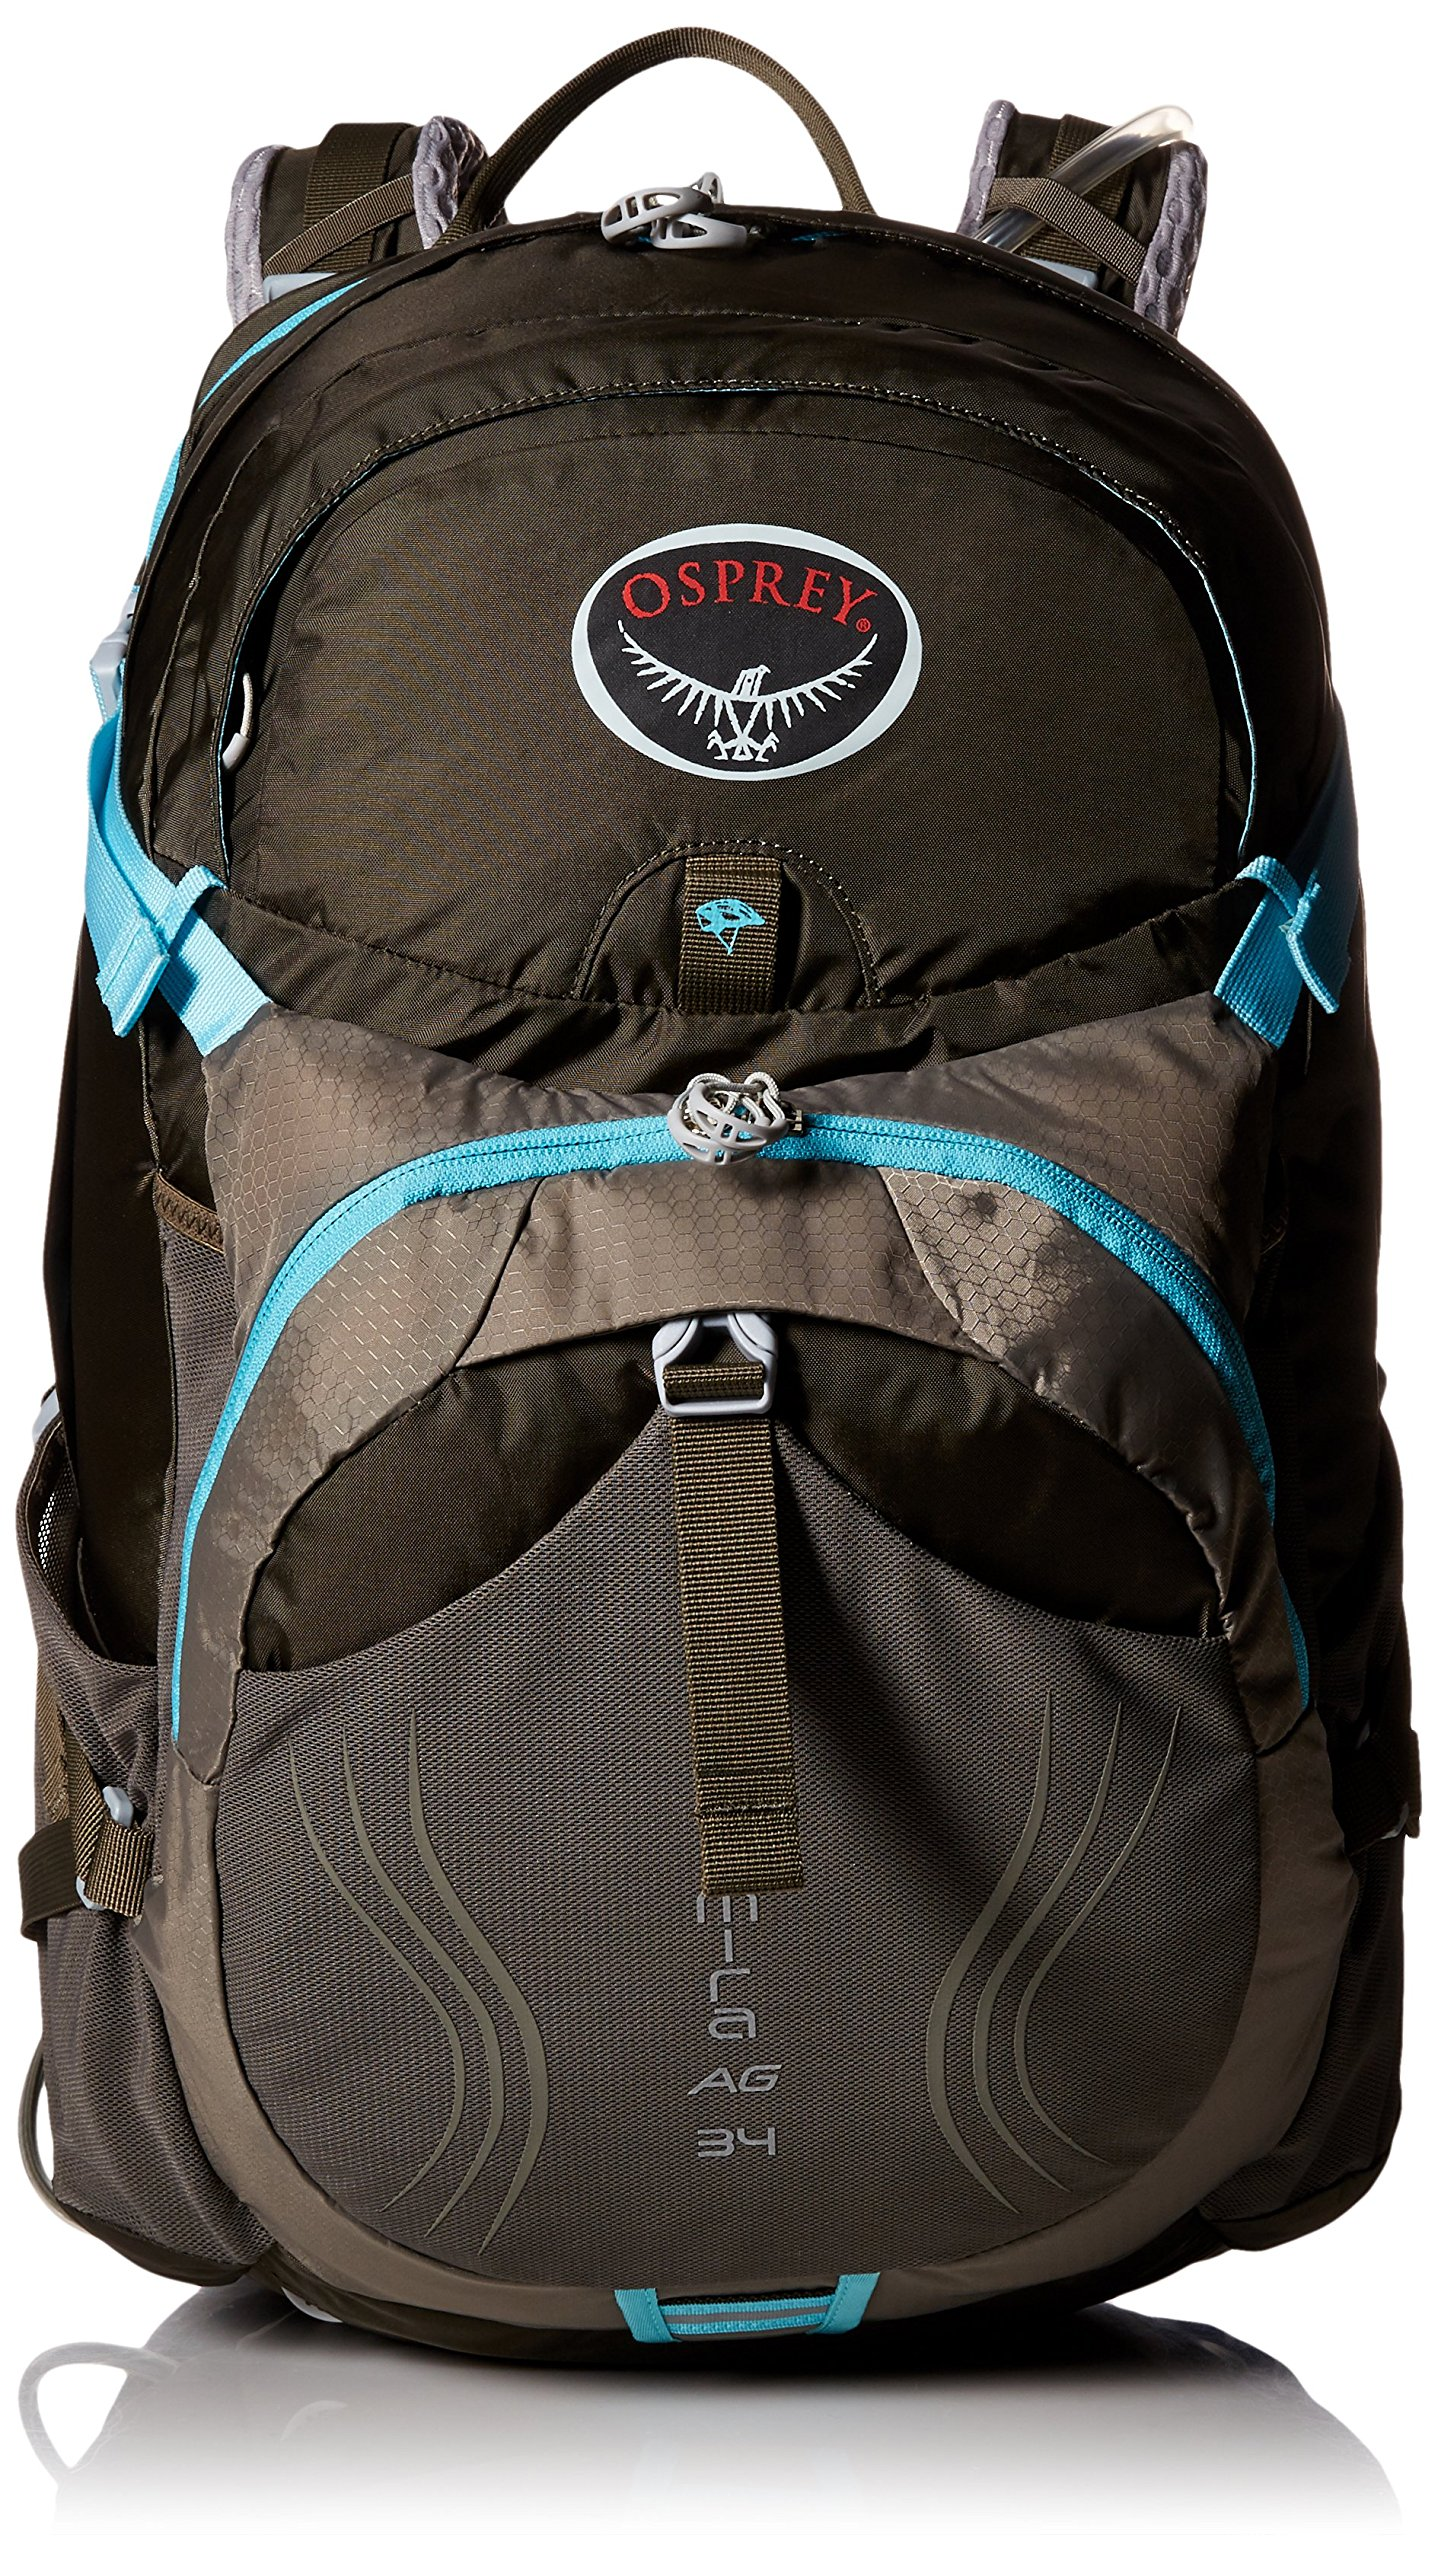 Osprey Packs Women's Mira AG 34 Hydration Pack, Misty Grey, X-Small/Small